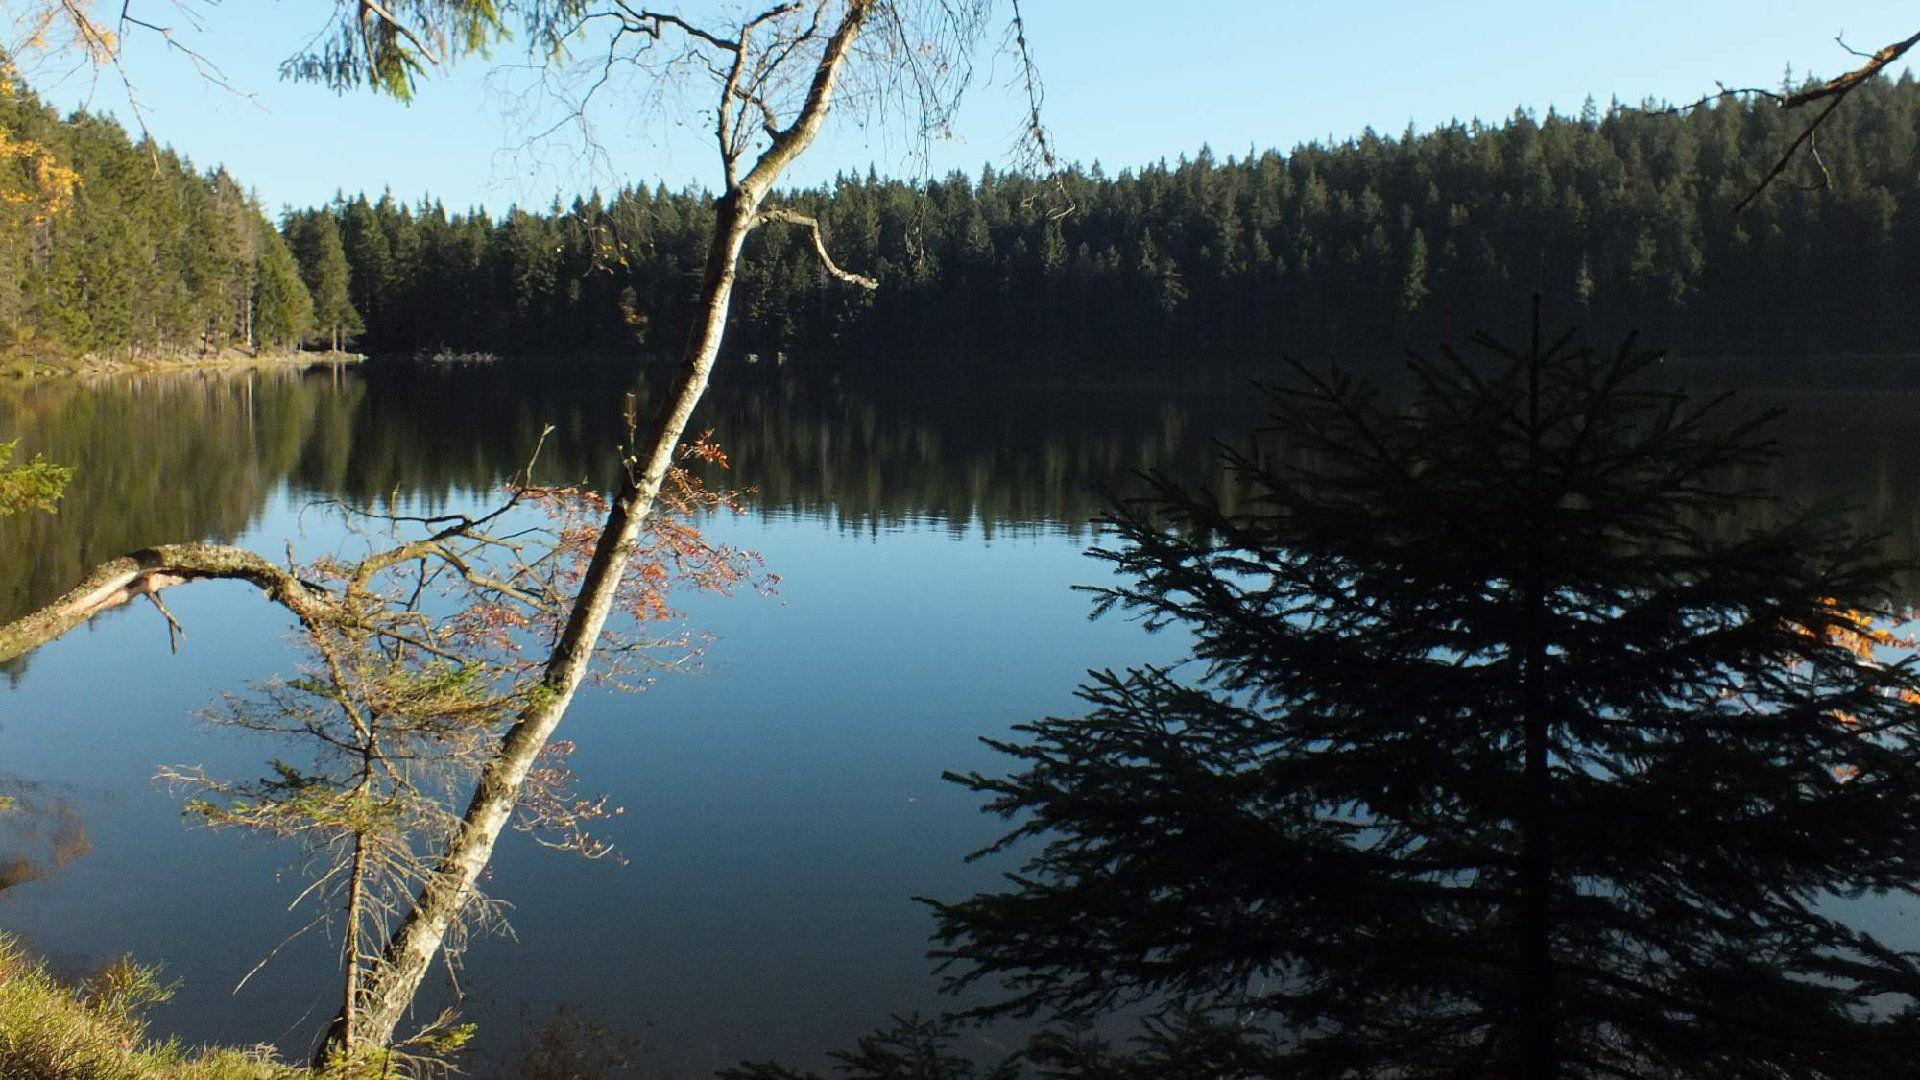 Čertovo jezero Šumava – Mapa, trasa, pověsti